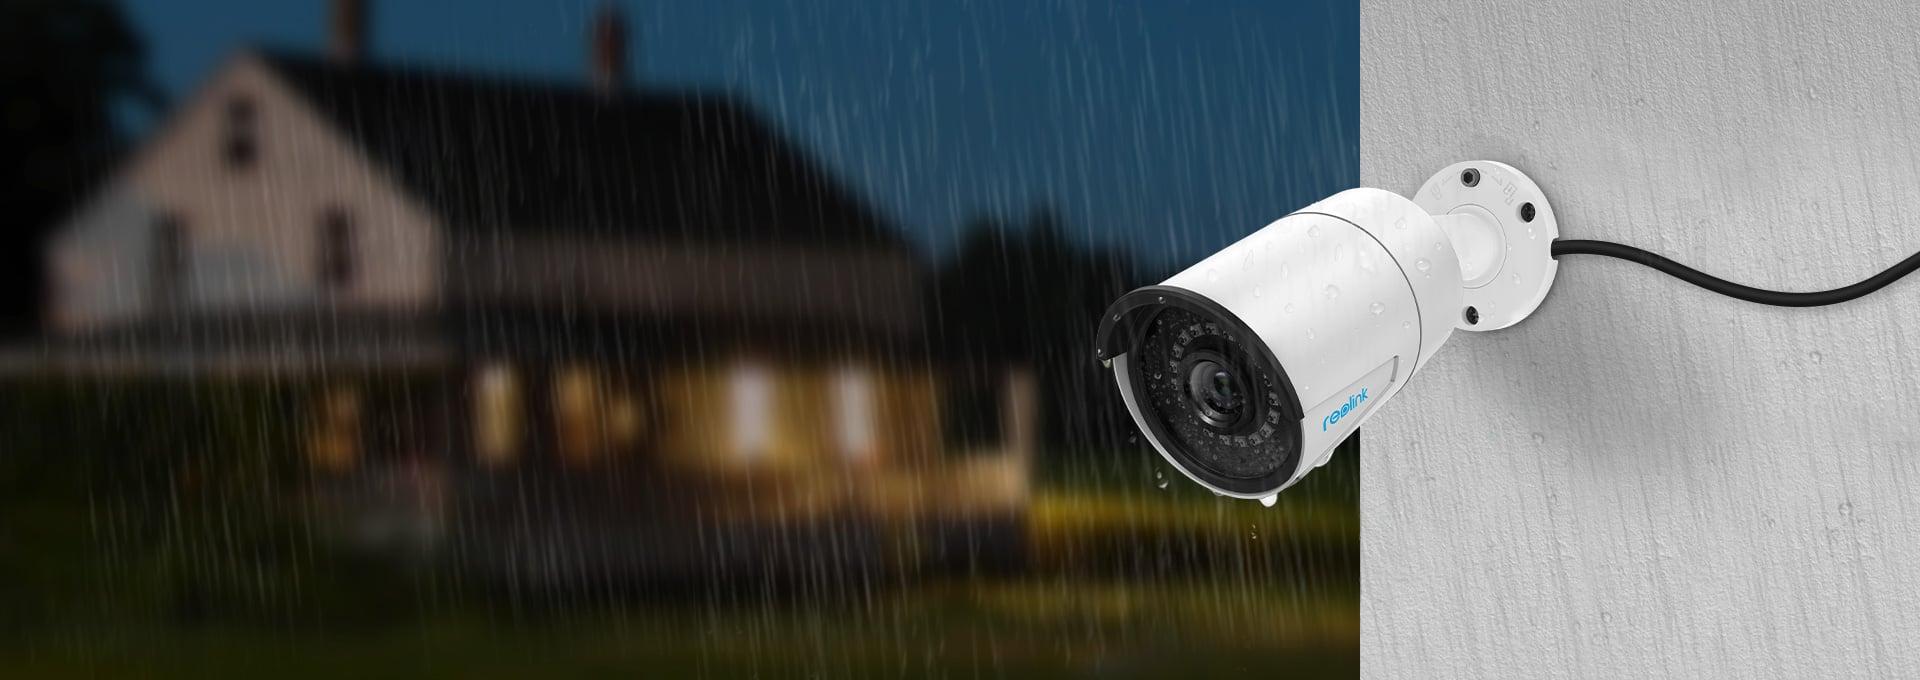 Best Indoor and Outdoor Video Surveillance System PoE